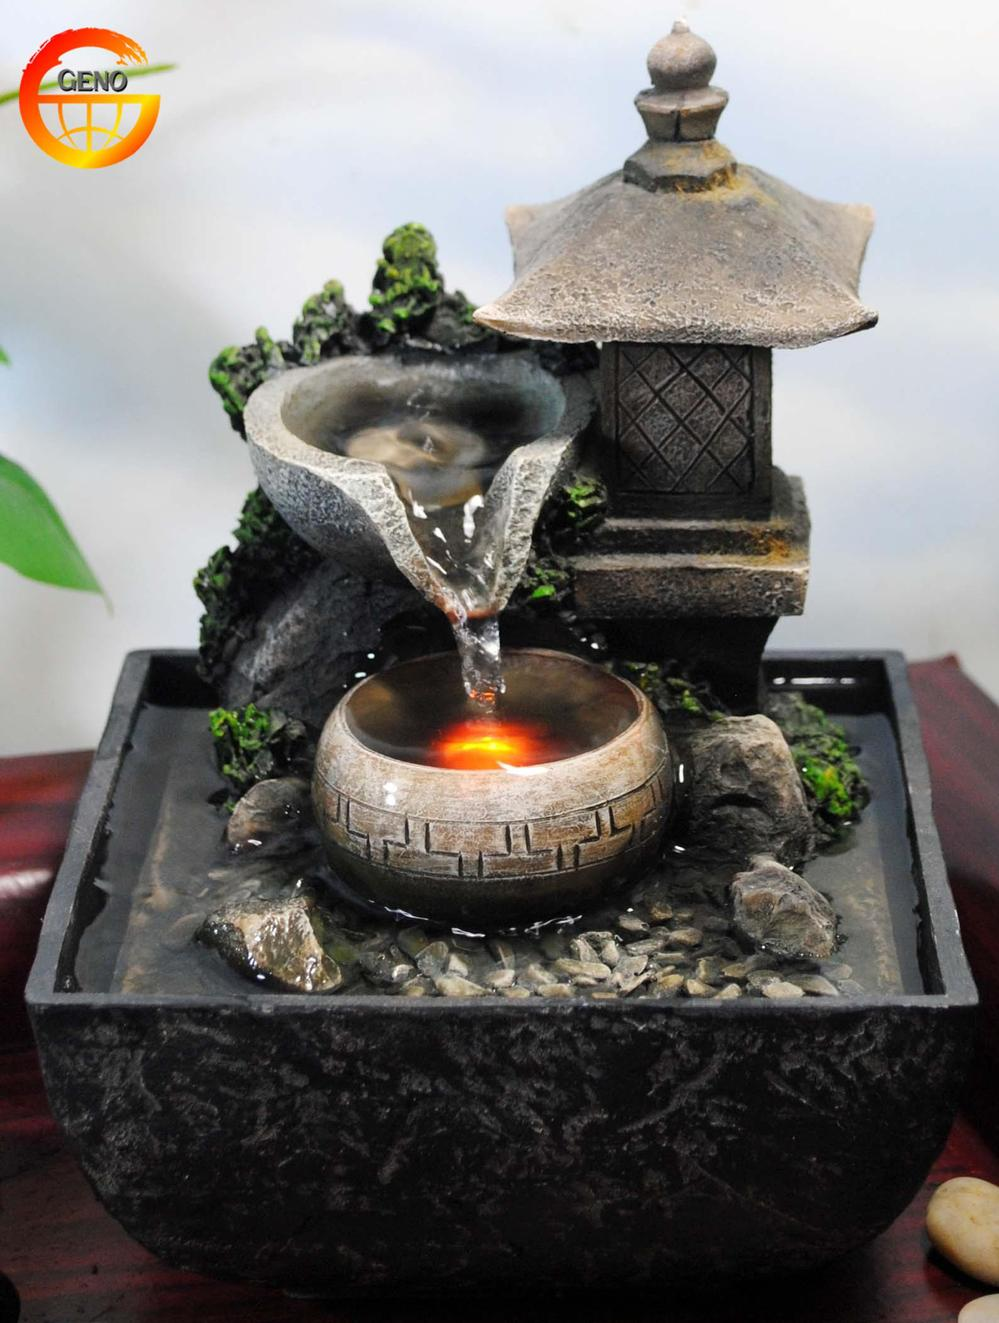 Decorazione giardino da fontane - Fontana zen da tavolo ...